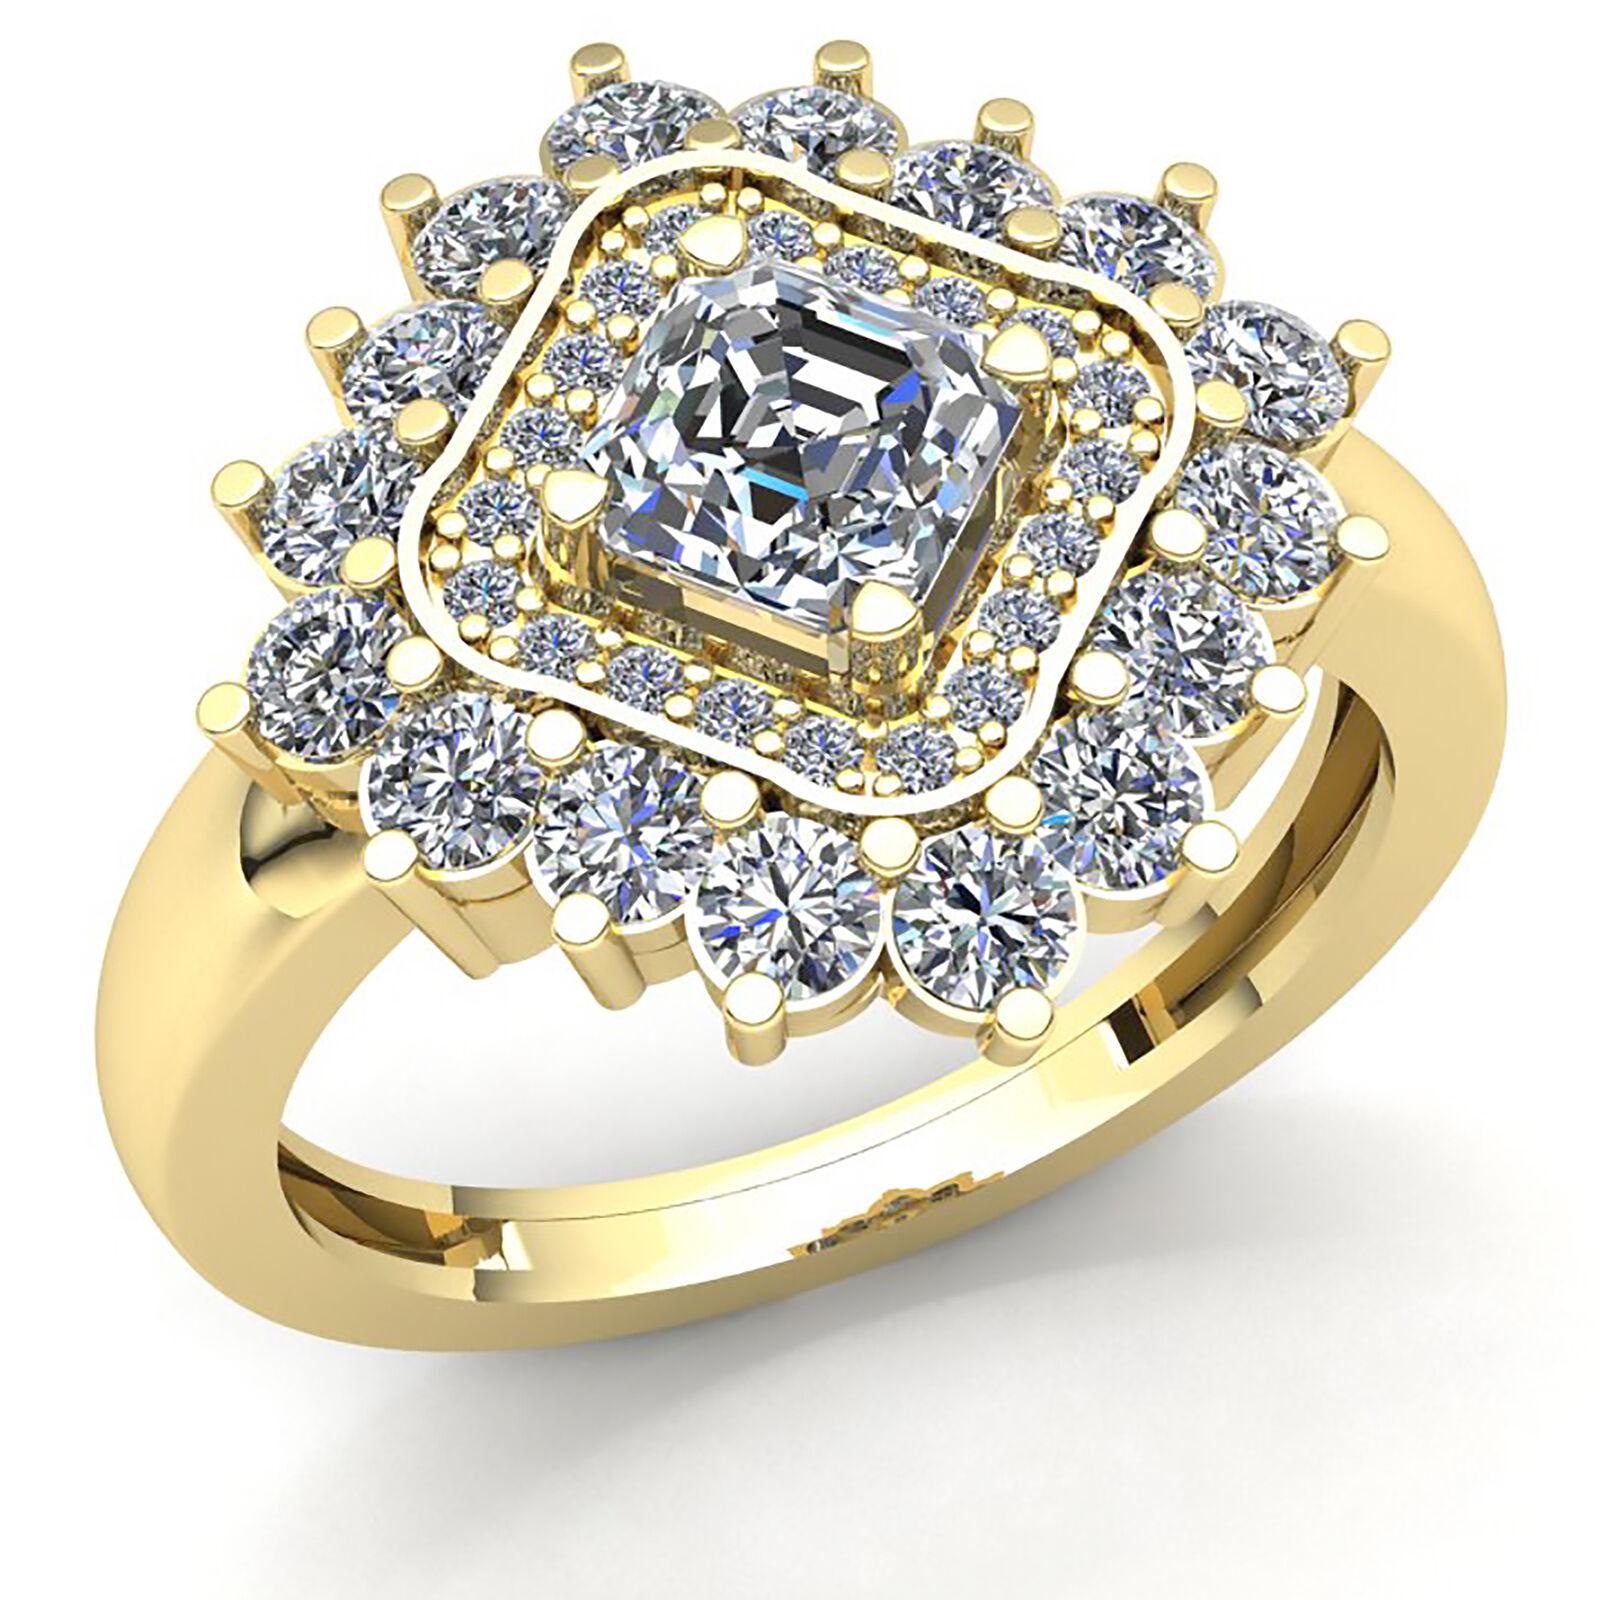 c7b69d1fe9728 Genuine 1.50ct Princess Cut Diamond Womens Double Halo Engagement Ring 10K  gold nwnvfp6146-Diamond